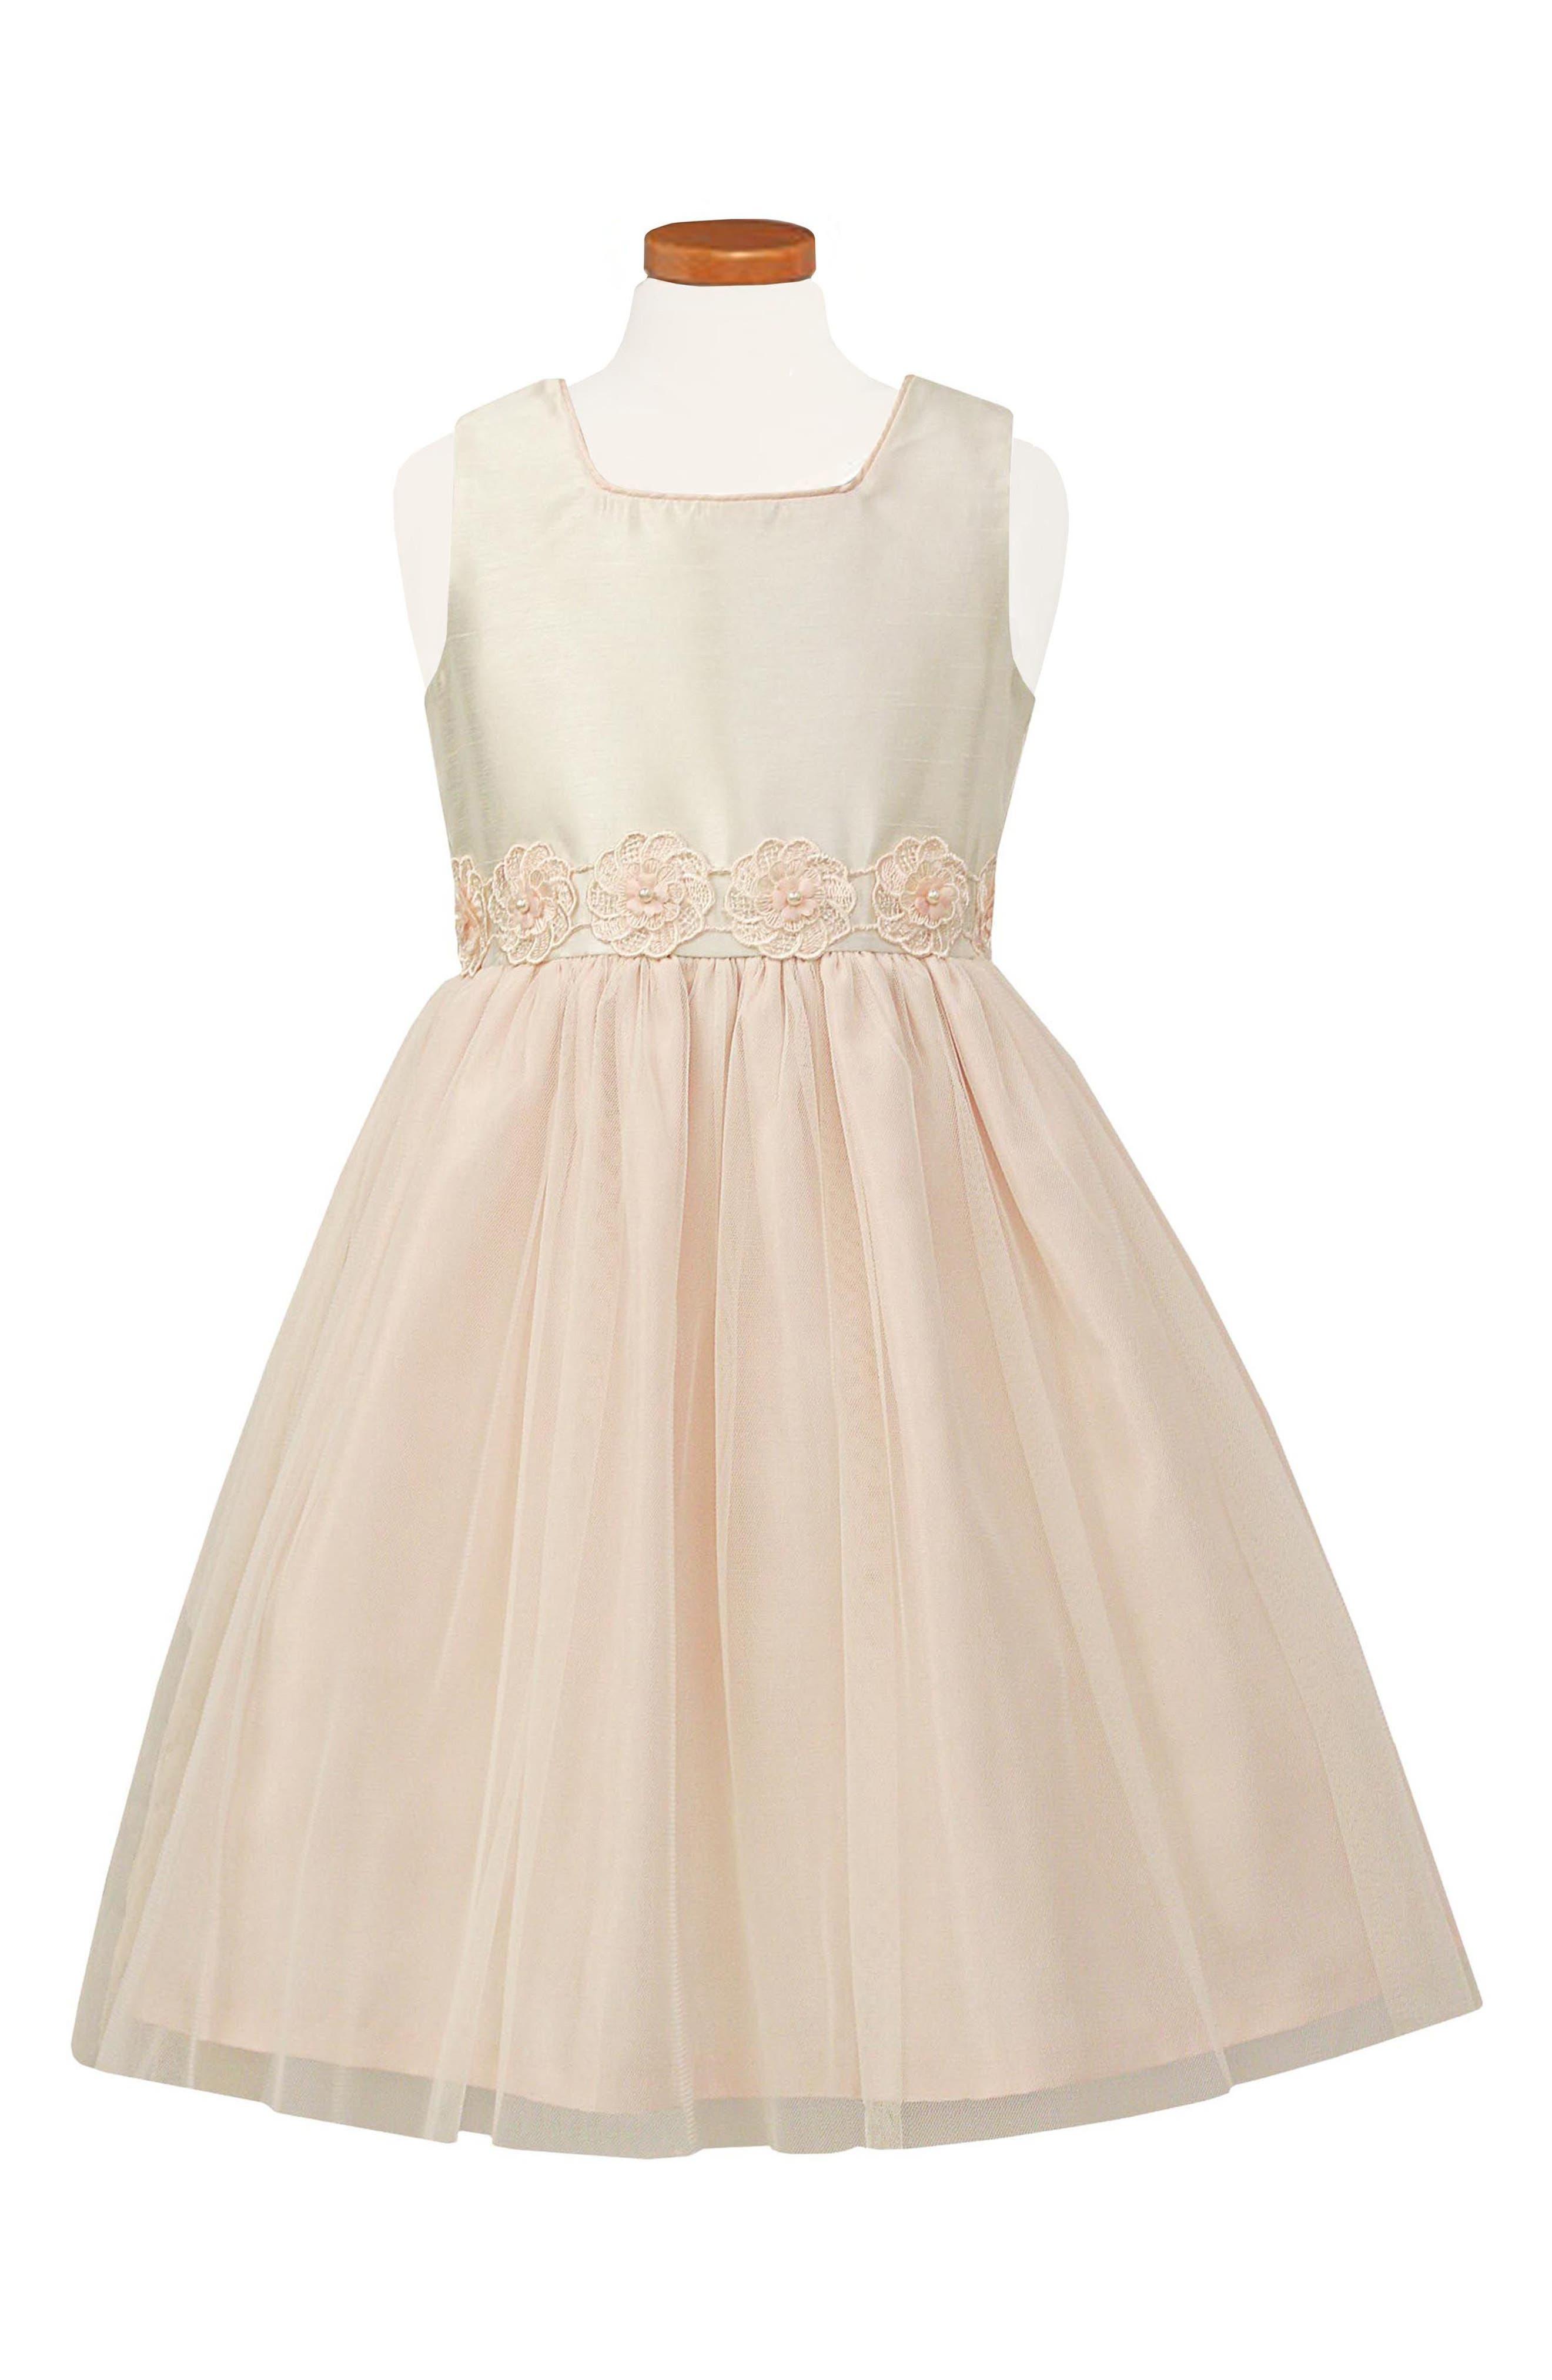 Sorbet Tulle & Organza Party Dress ( Toddler Girls, Little Girls & Big Girls)